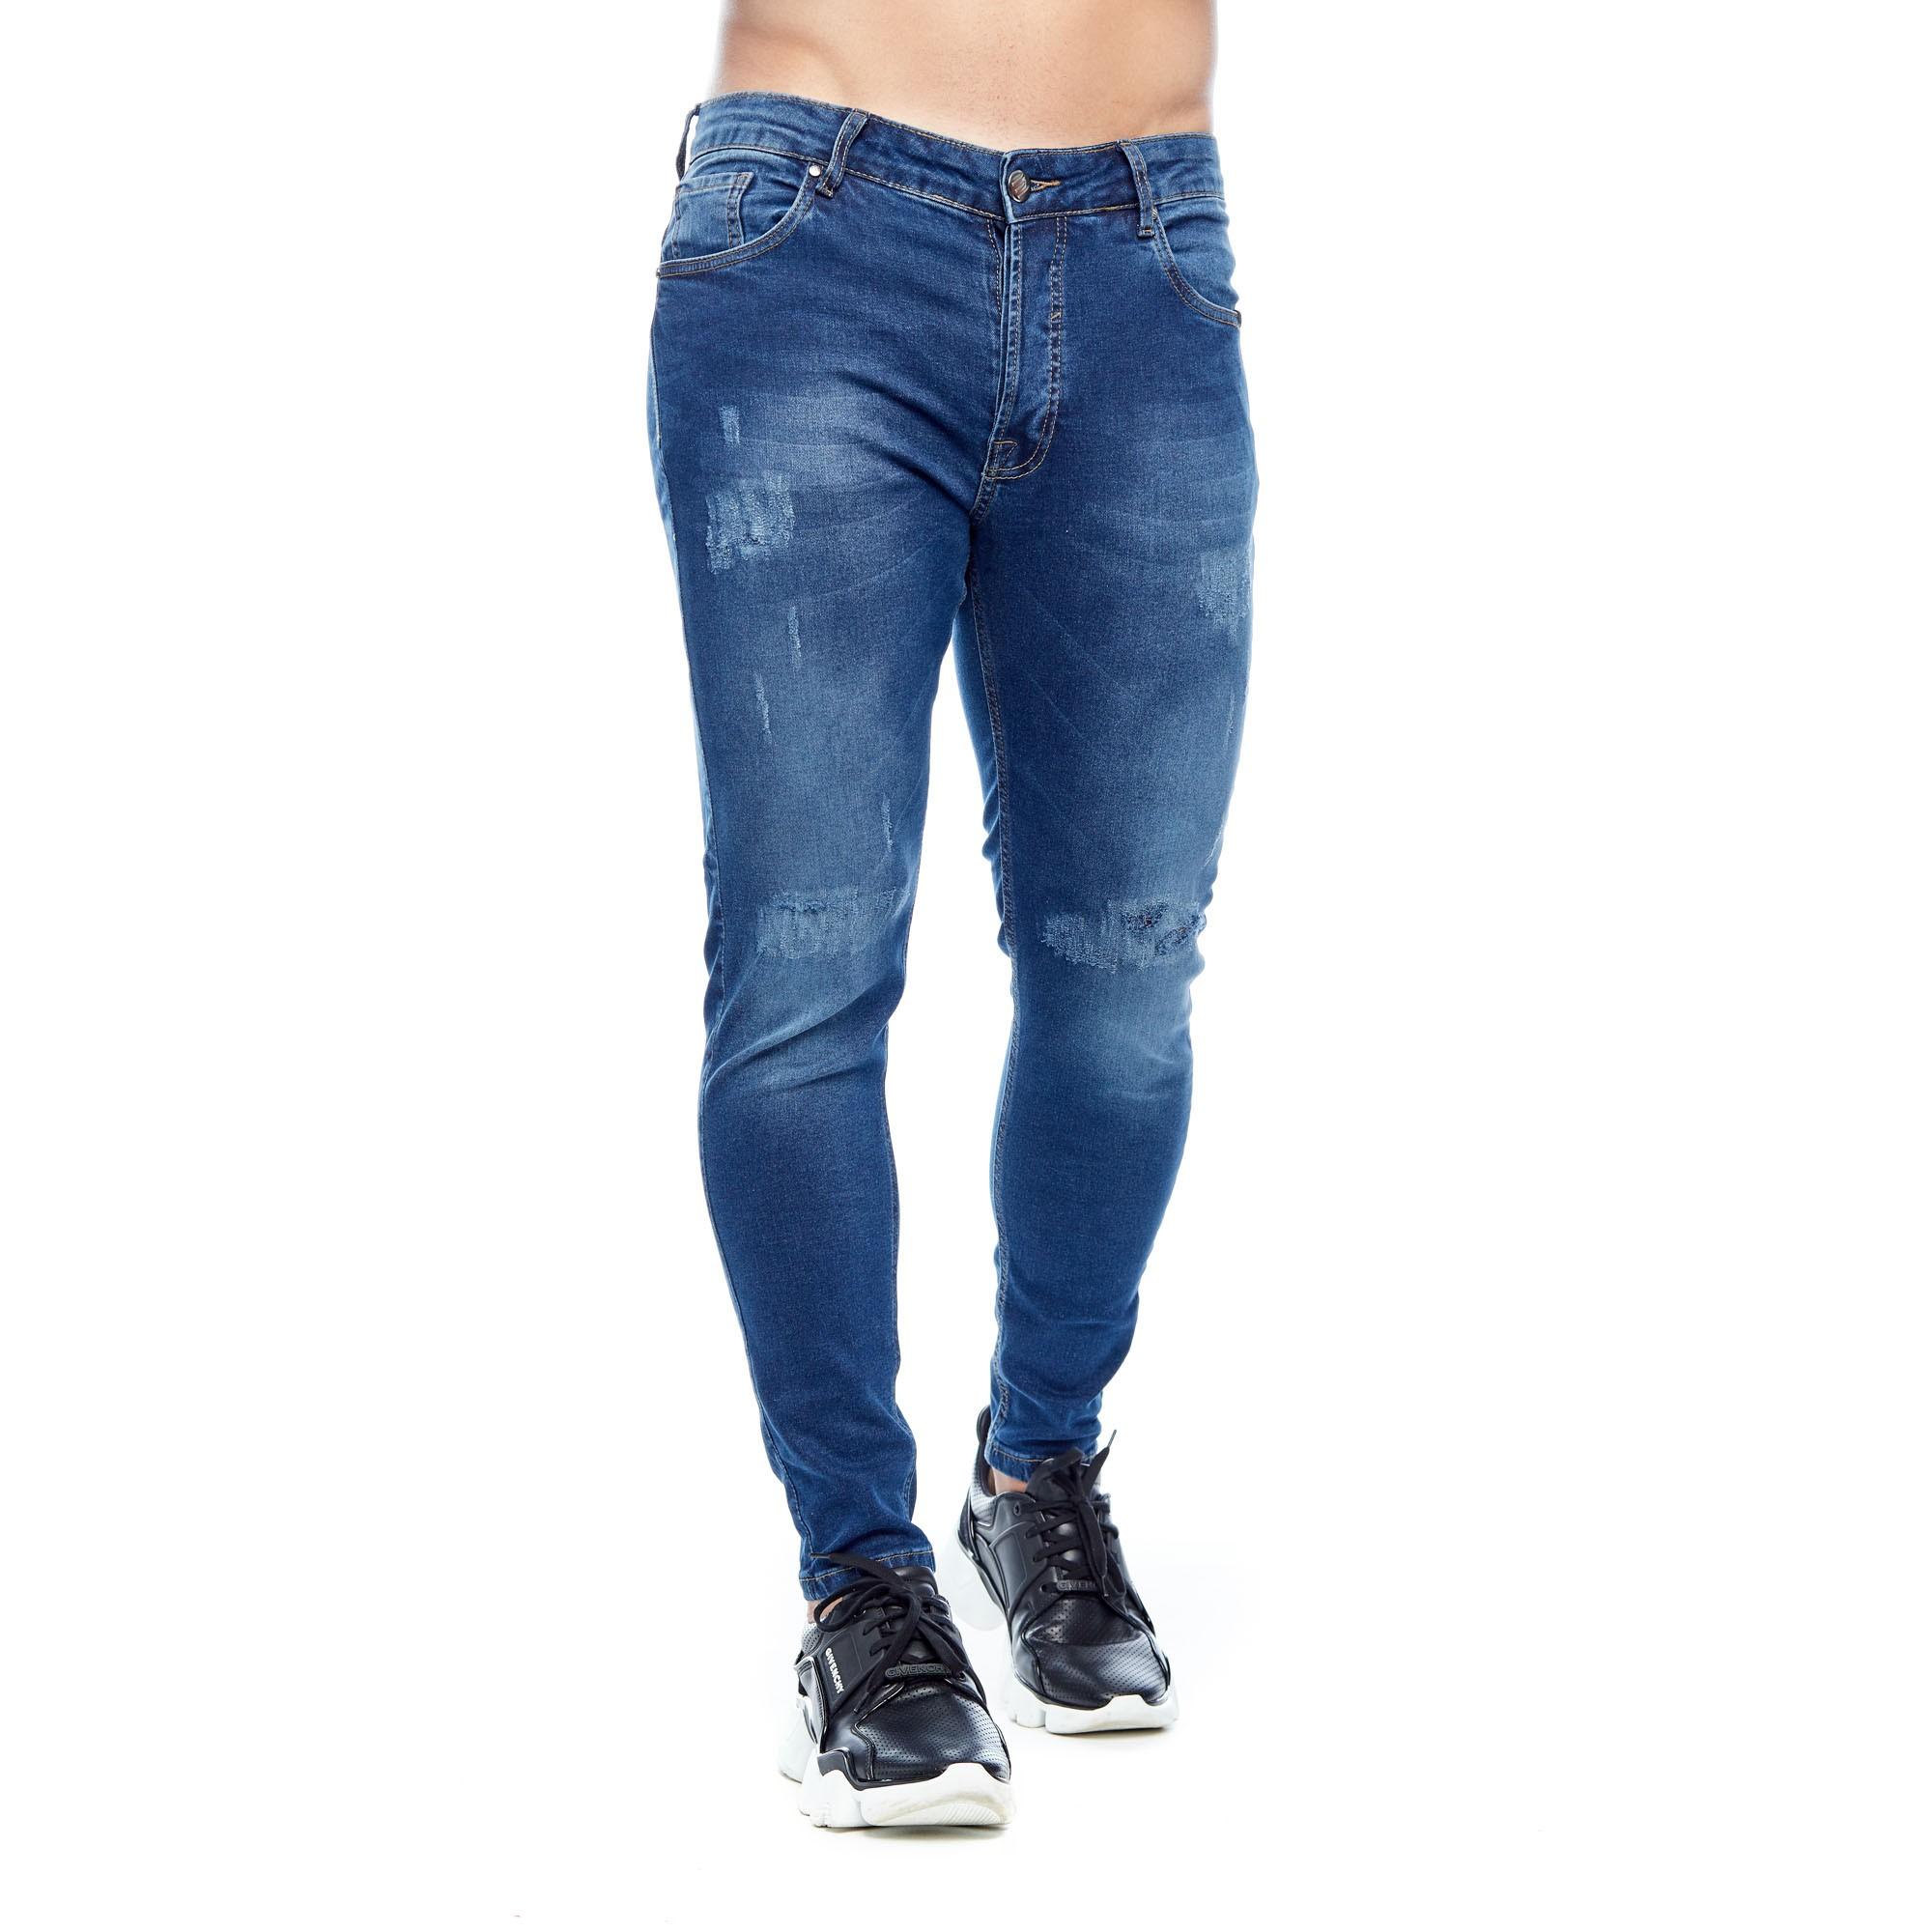 Calça Jeans Evolvee Premium Stretch